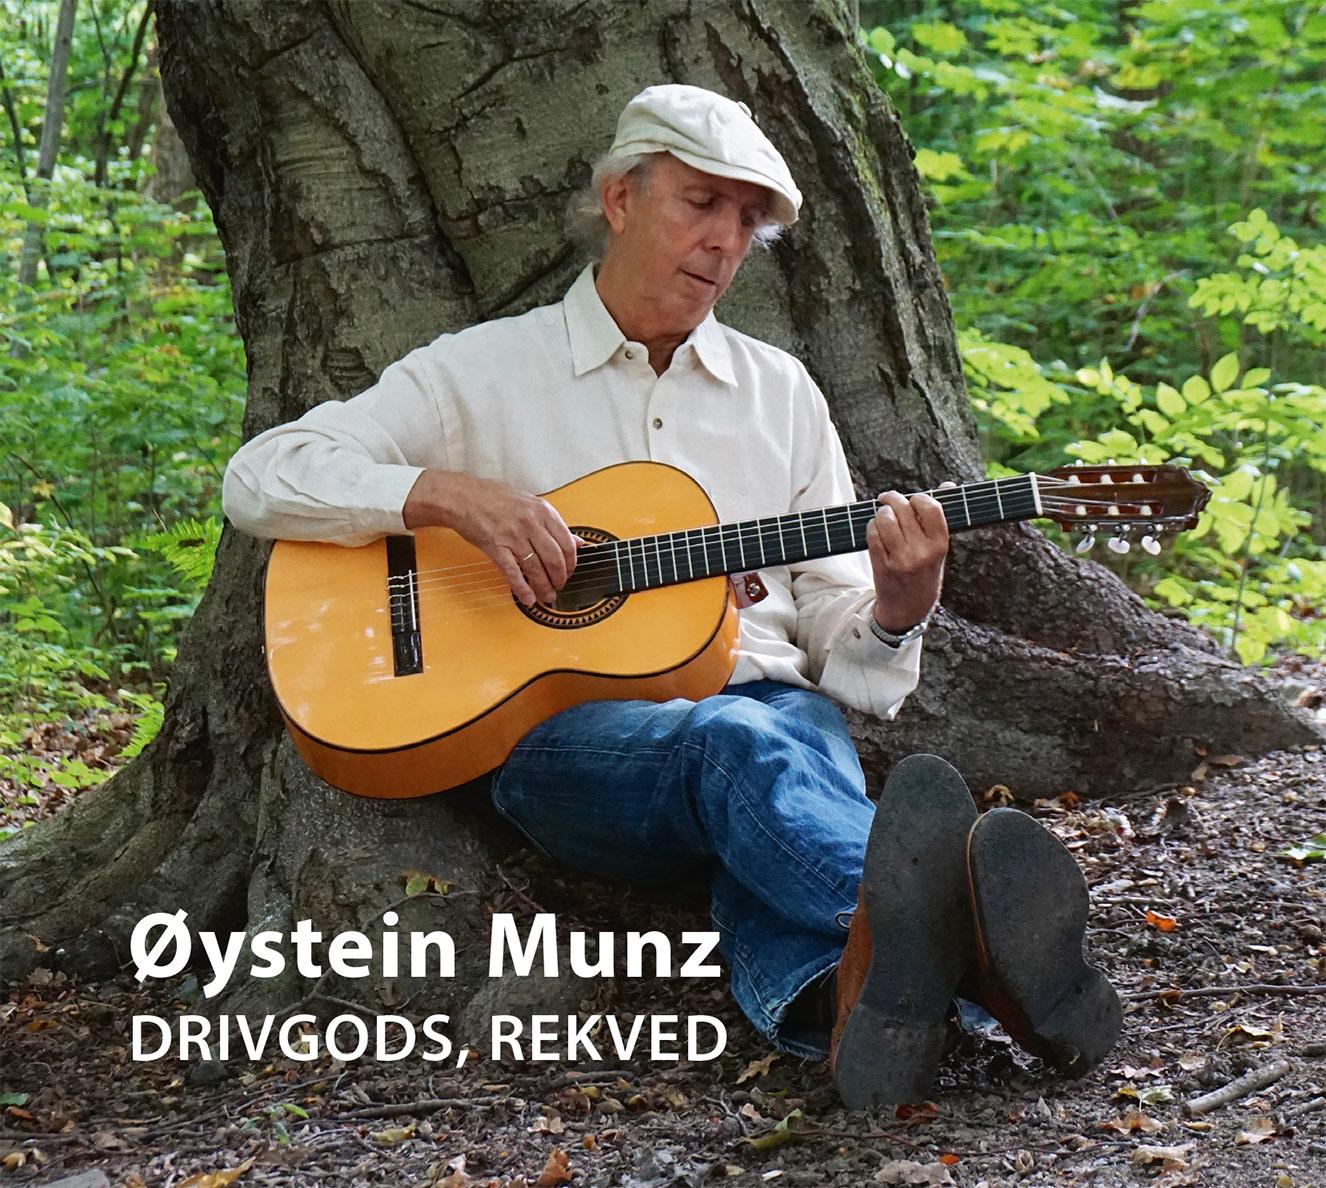 Øysten Munz CD-omslag